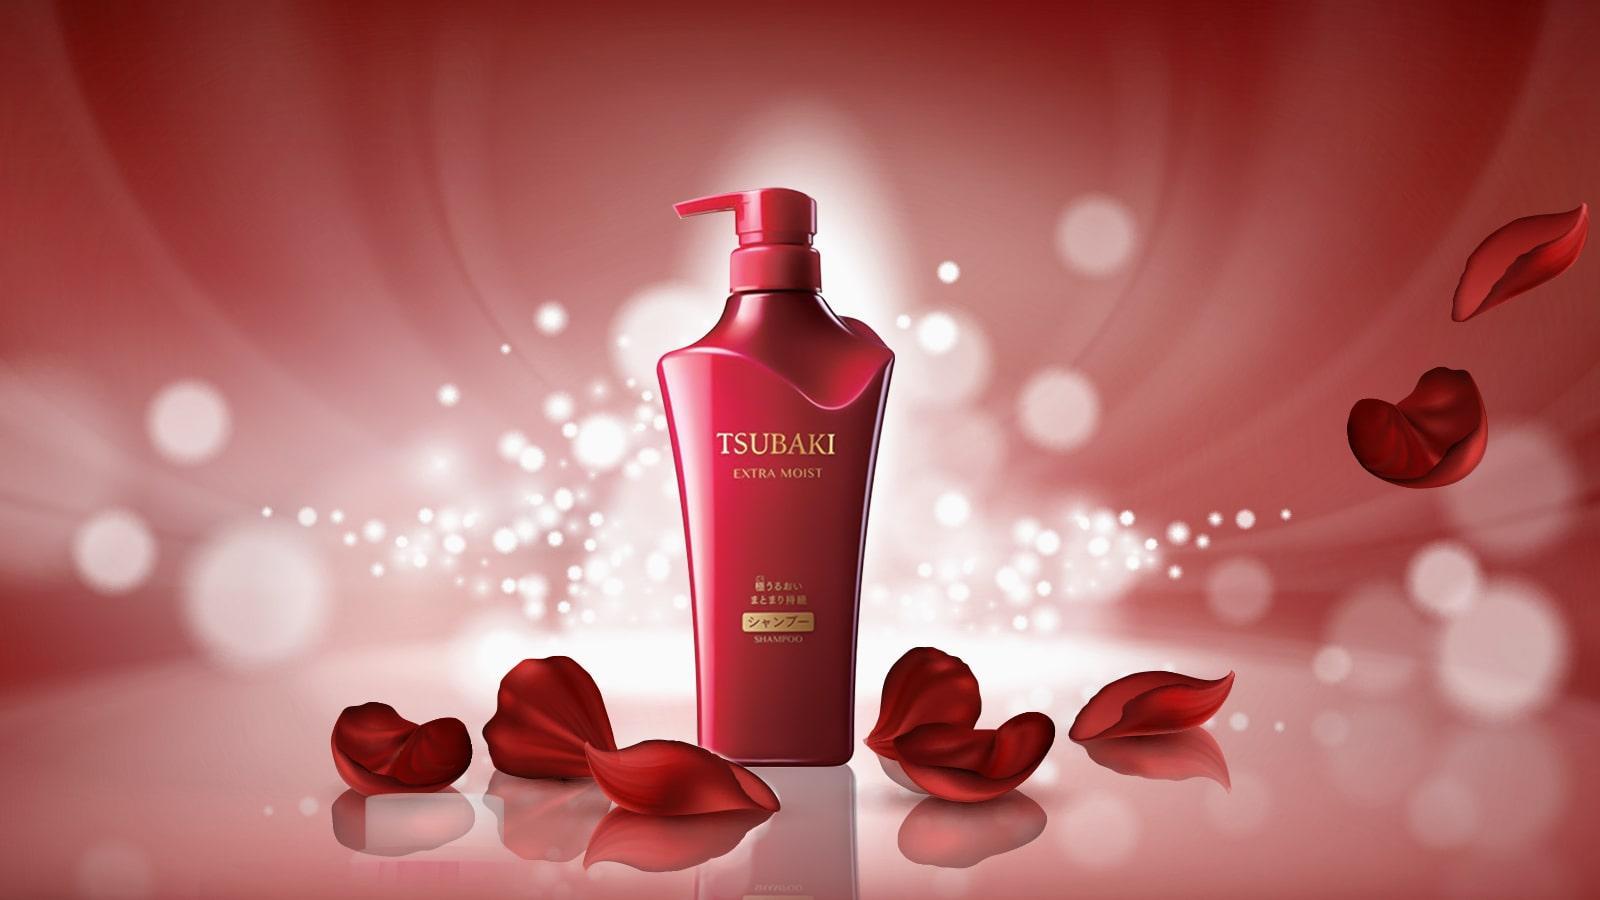 Dầu gội siêu cấp ẩm Shiseido Tsubaki Extra Moist 500ml